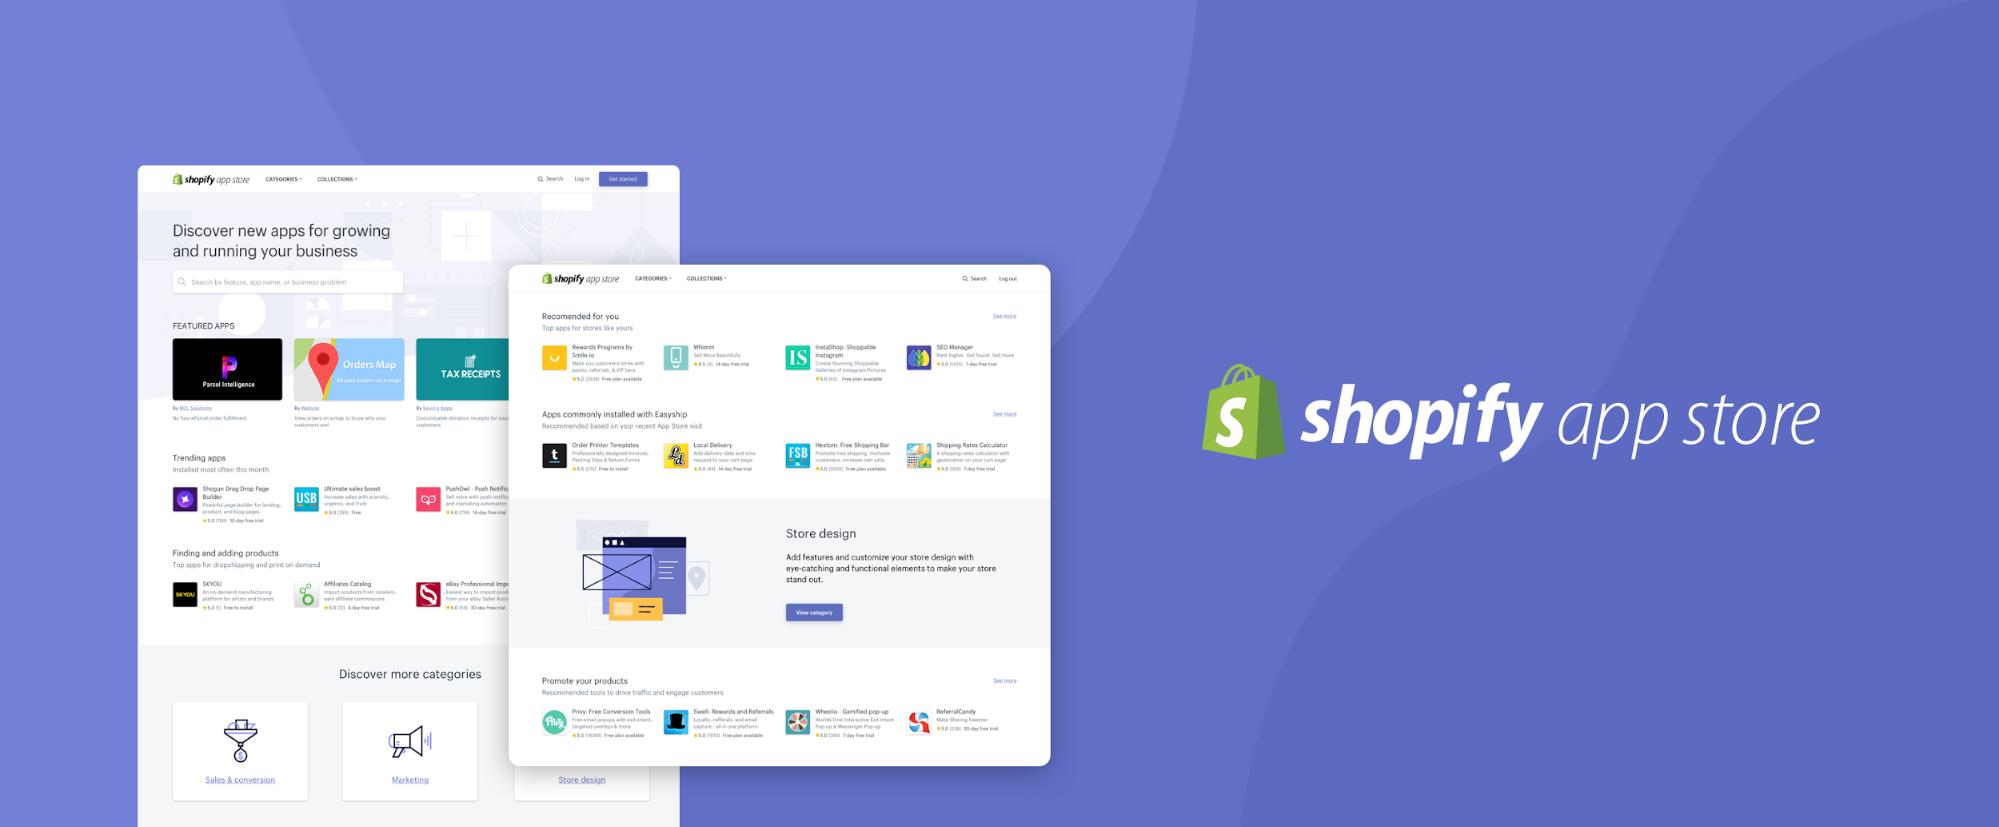 Shopify Unite 2018